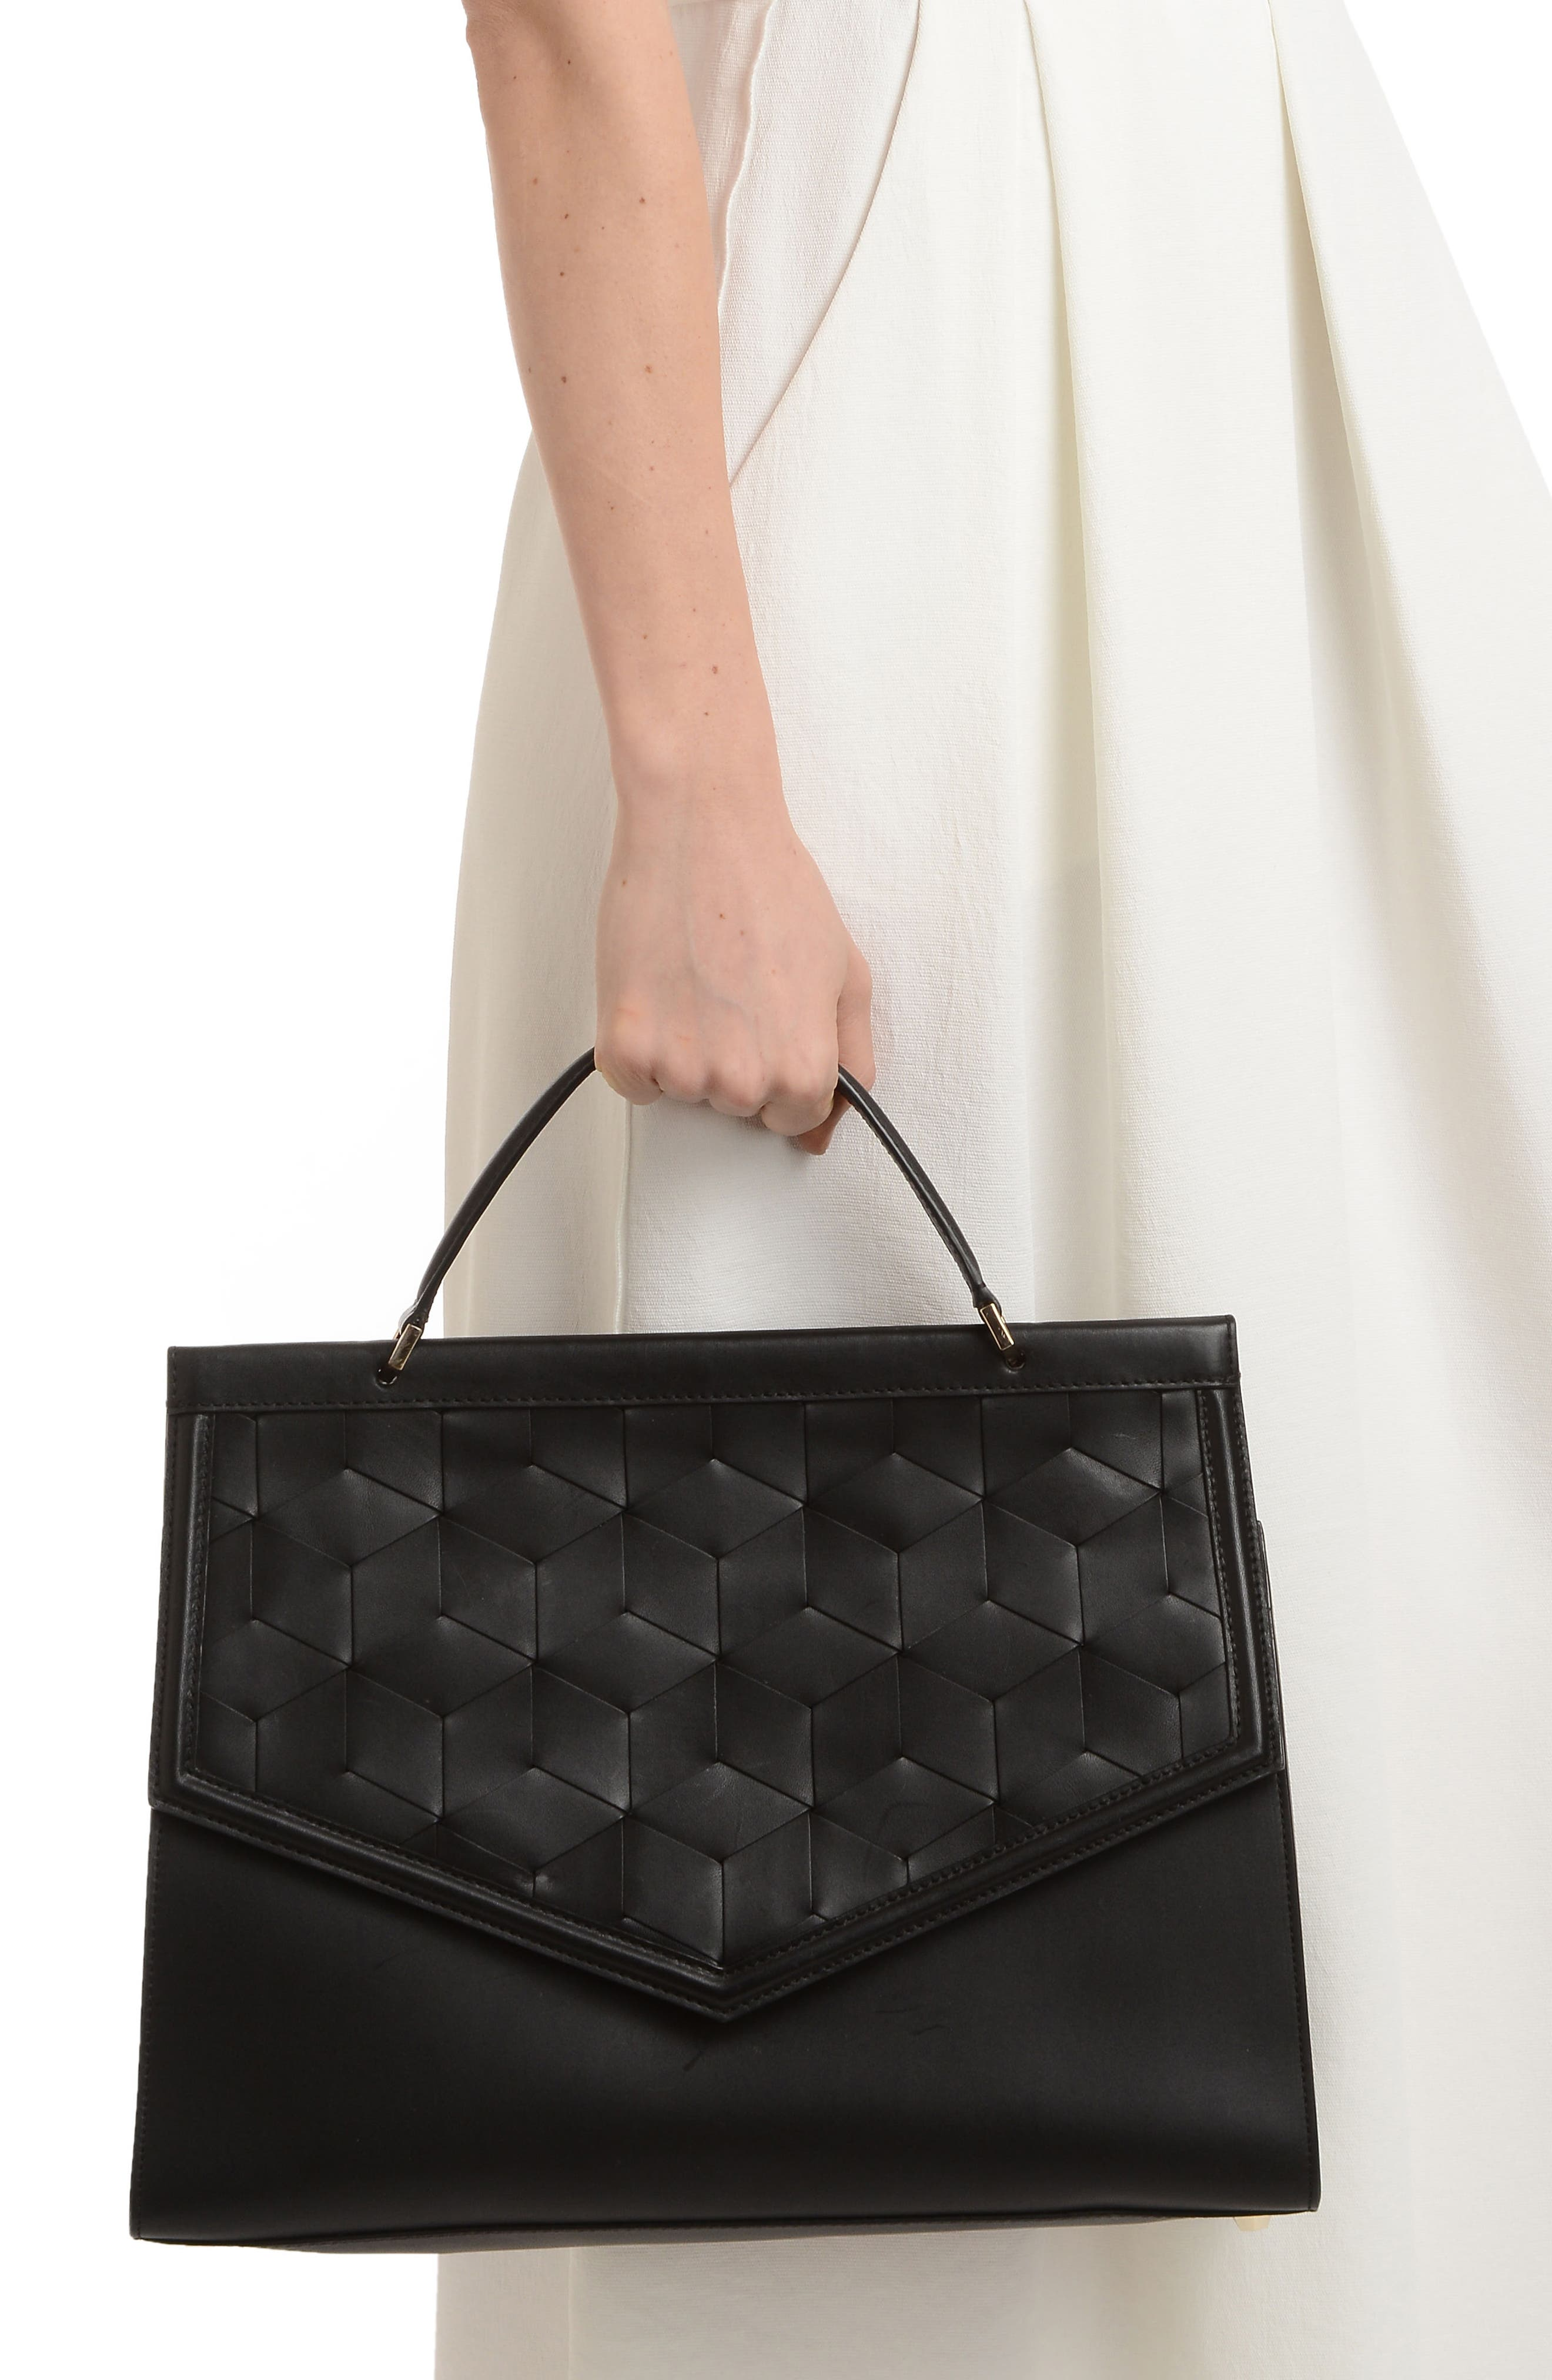 Wayfare Calfskin Leather Top Handle Satchel,                             Alternate thumbnail 2, color,                             BLACK